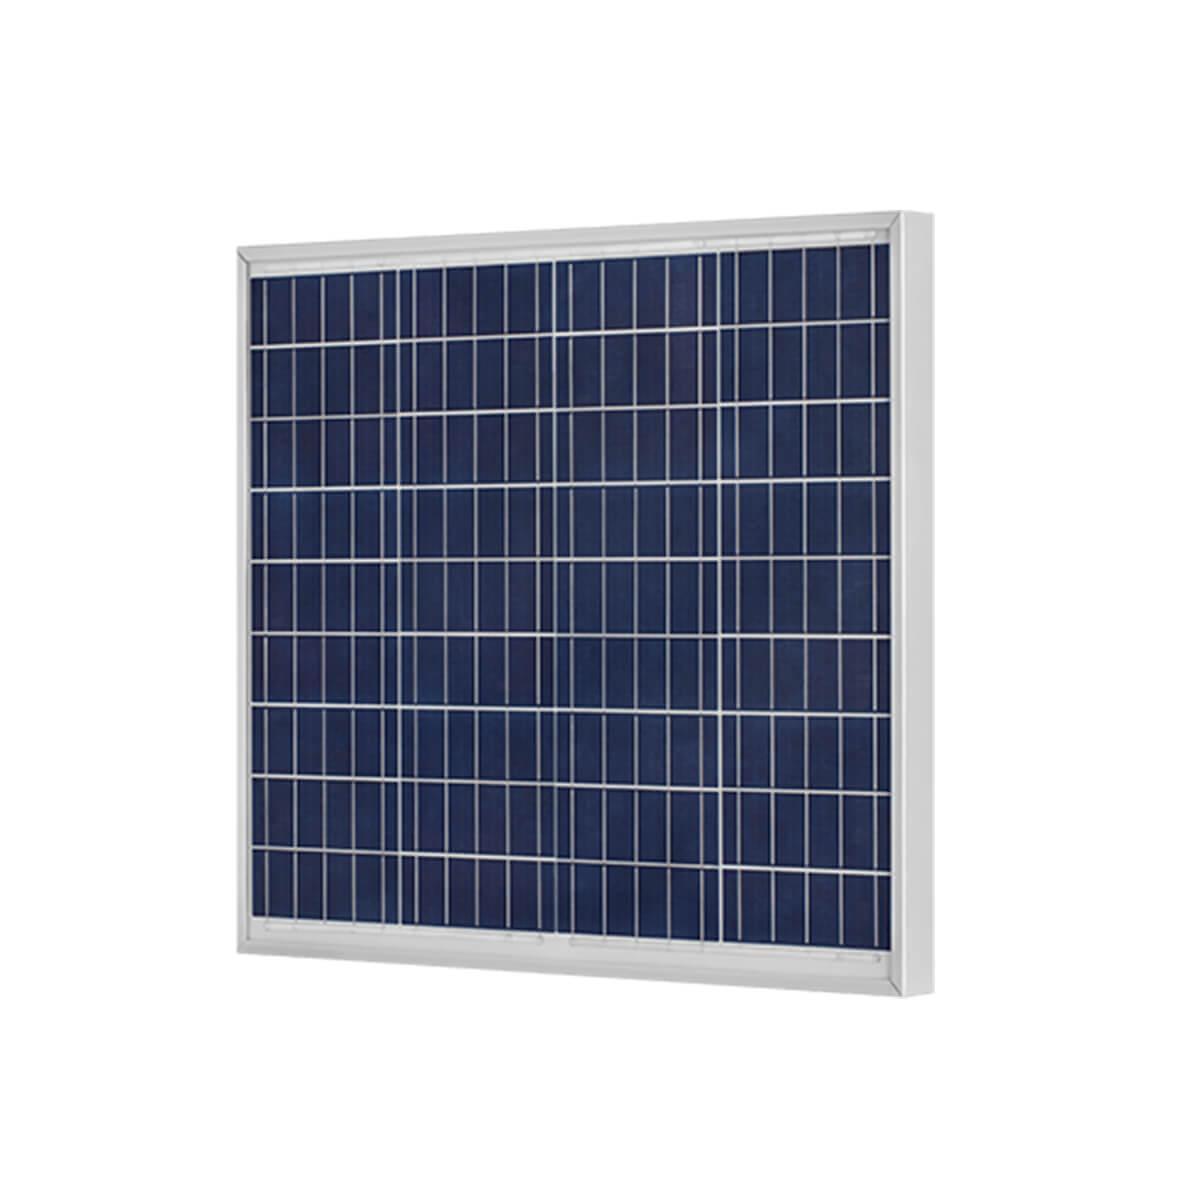 Odul solar 50W panel, odul solar 50Watt panel, Odul solar 50 W panel, odul solar 50 Watt panel, odul solar 50 Watt polikristal panel, Odul solar 50 W watt gunes paneli, odul solar 50 W watt polikristal gunes paneli, odul solar 50 W Watt fotovoltaik polikristal solar panel, odul solar 50W polikristal gunes enerjisi, odul solar OSP-50W panel, ÖDÜL SOLAR 50 WATT